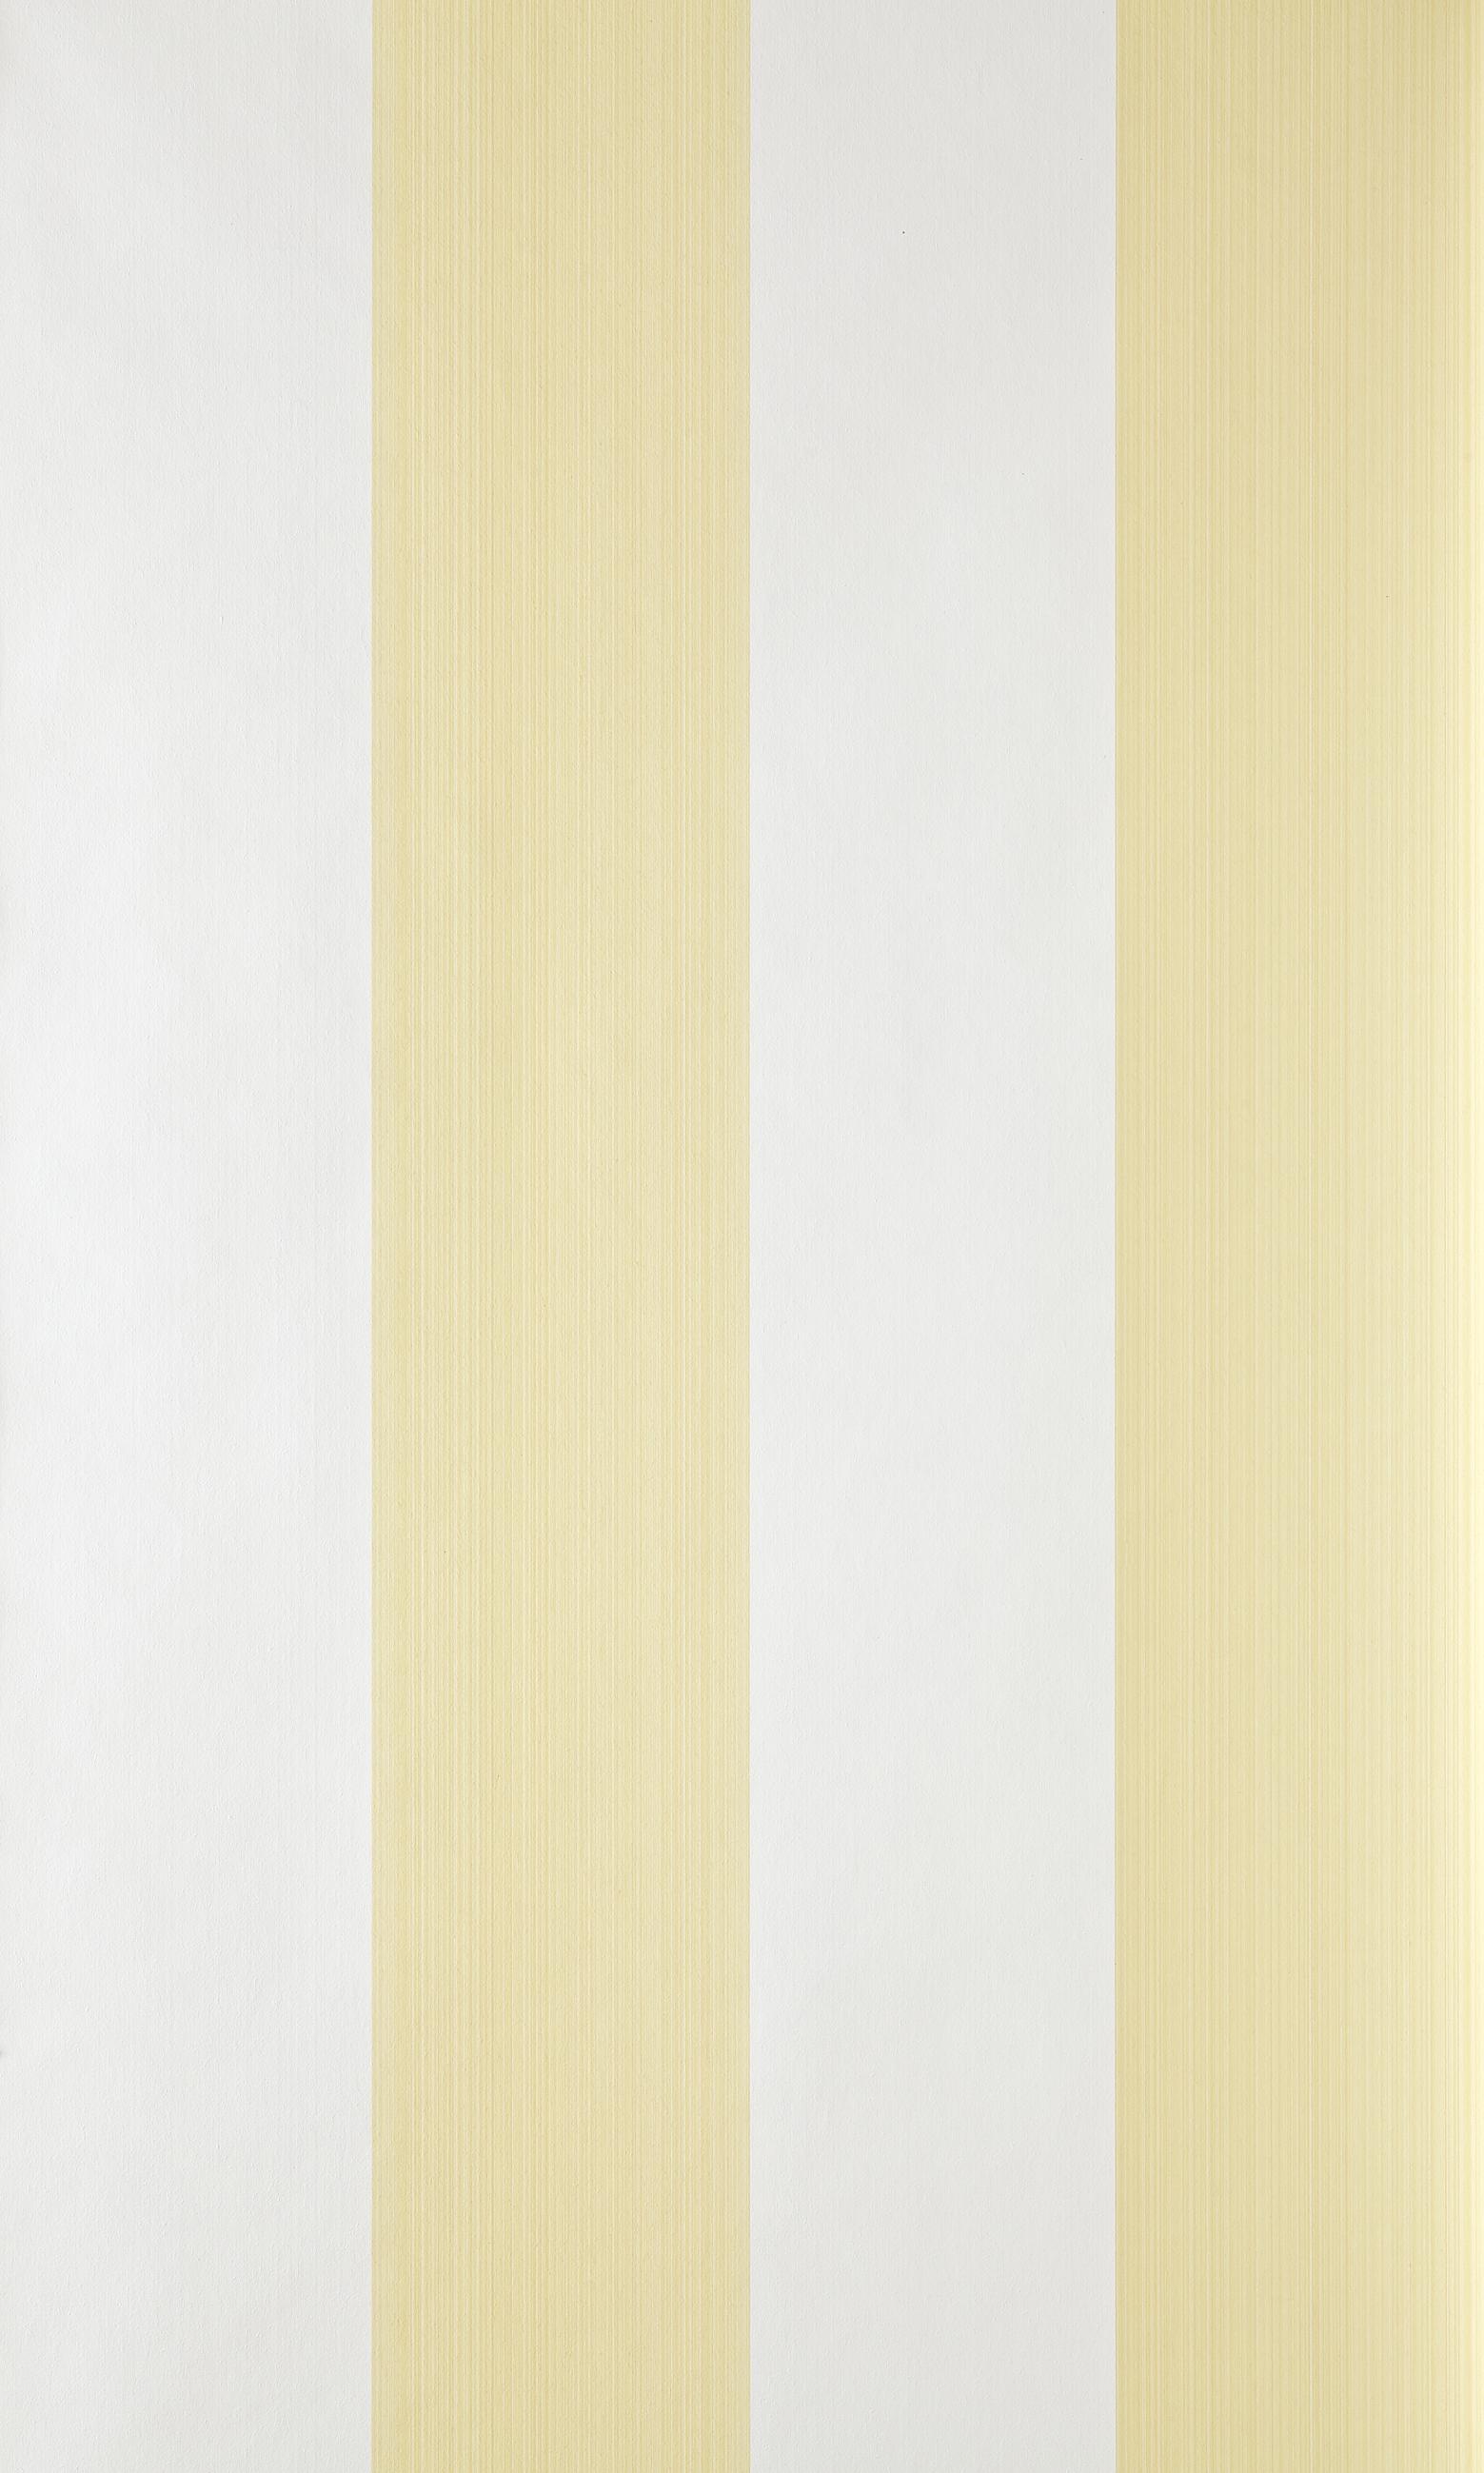 Broad Stripe 1319 $195 Per Roll  Order Now